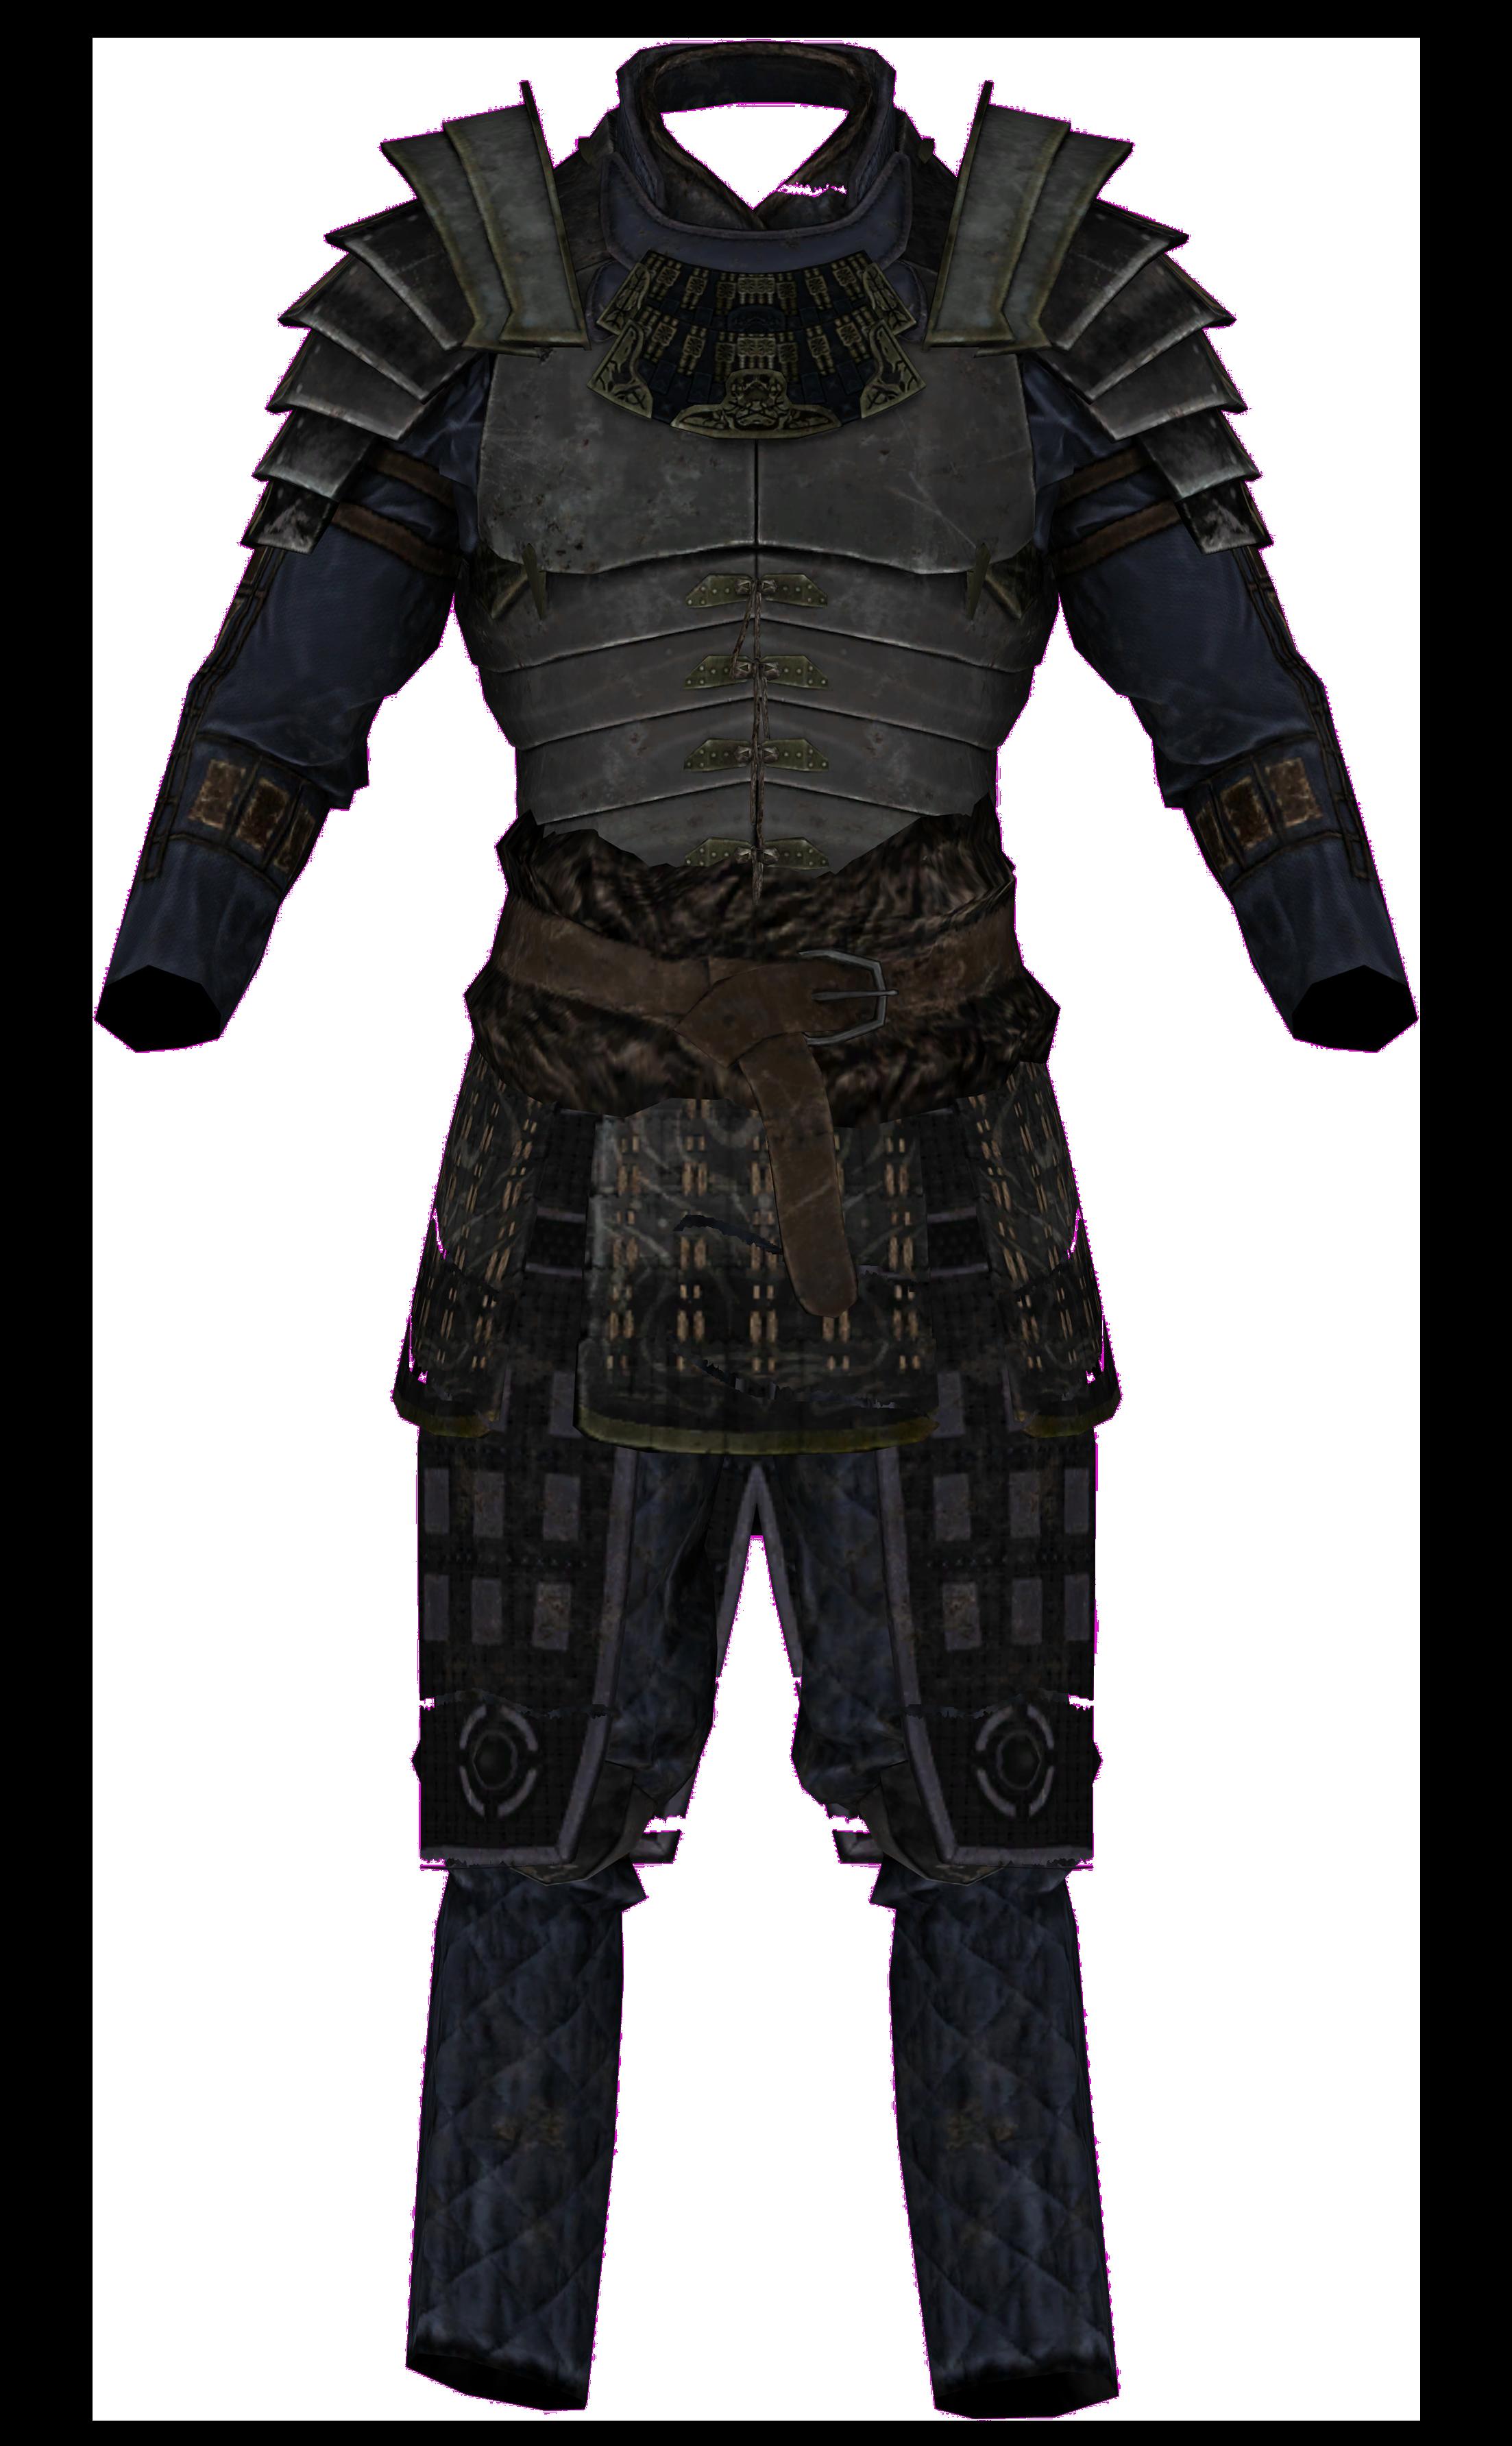 Blades Armor (Armor Piece)